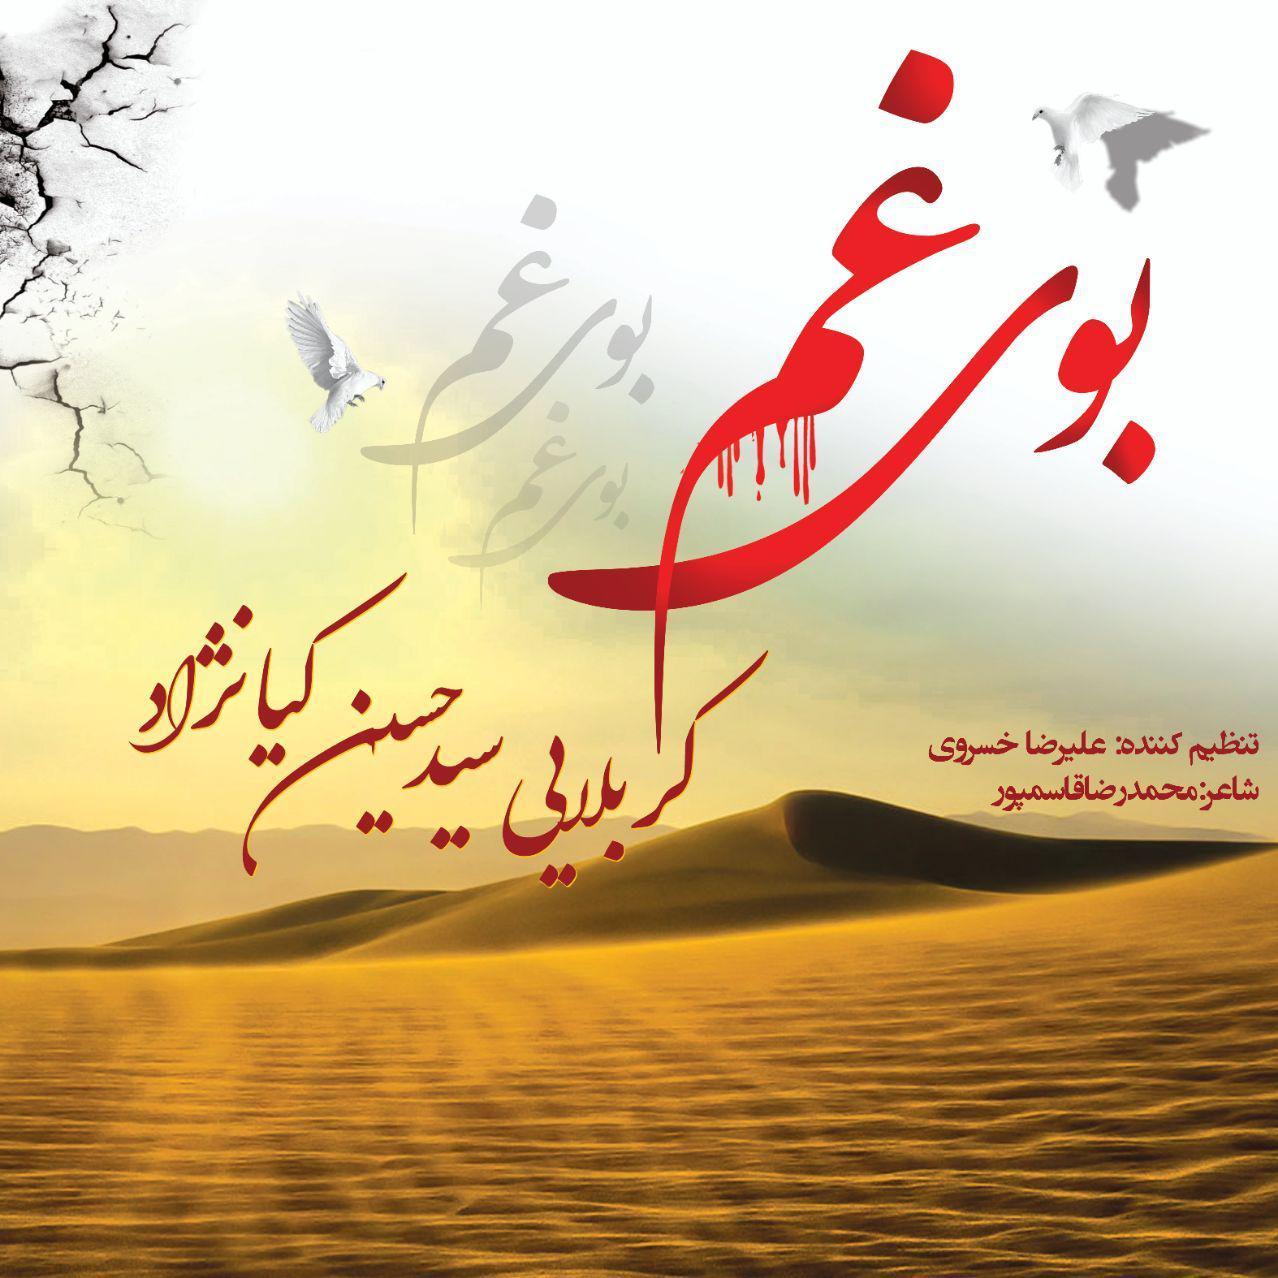 سید حسین کیانژاد به نام بوی غم